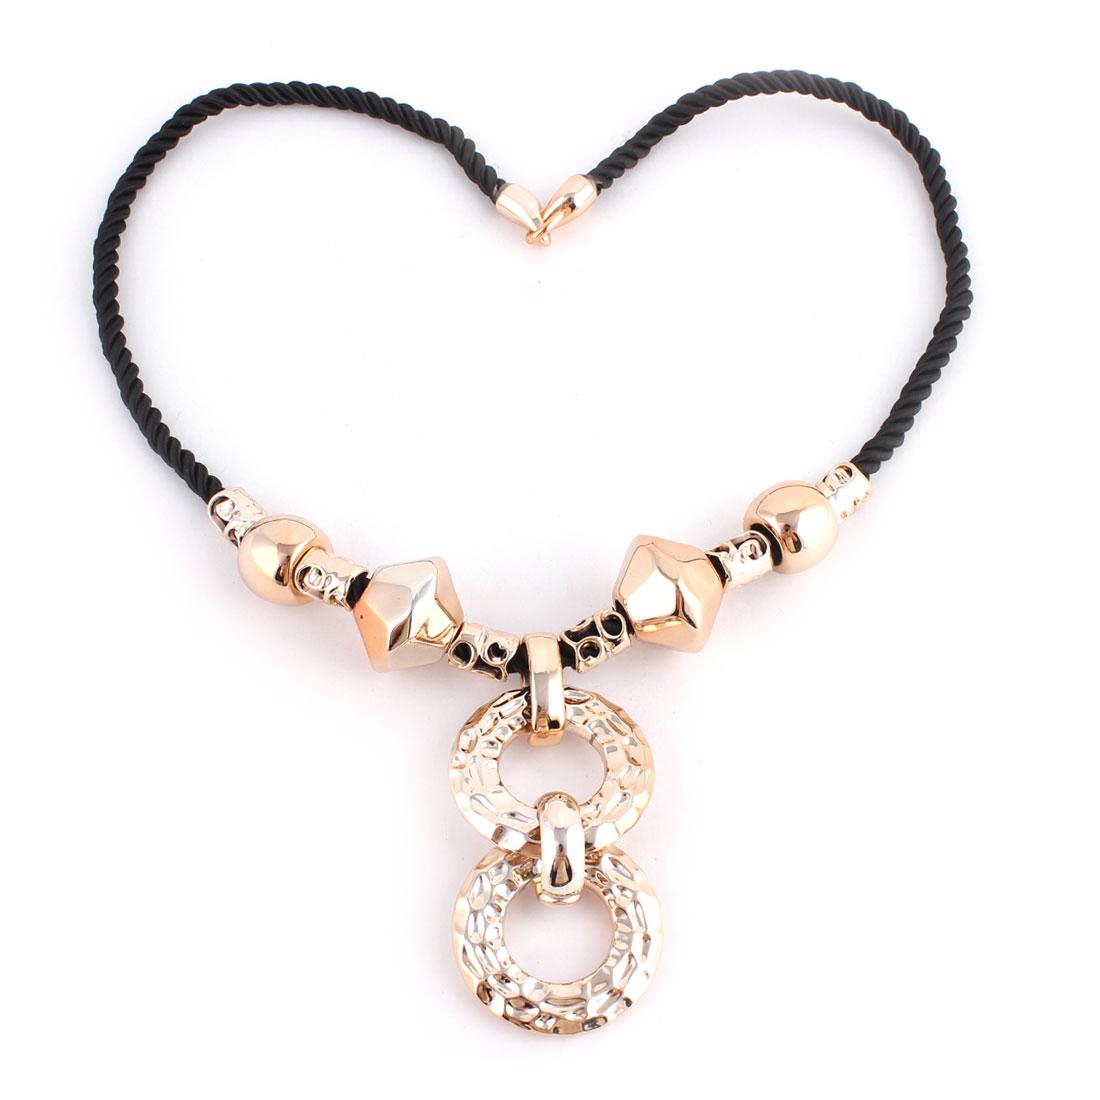 Lady Women Nylon Cord Linked Sweater Dress Necklace Chain Collar Copper Tone Black